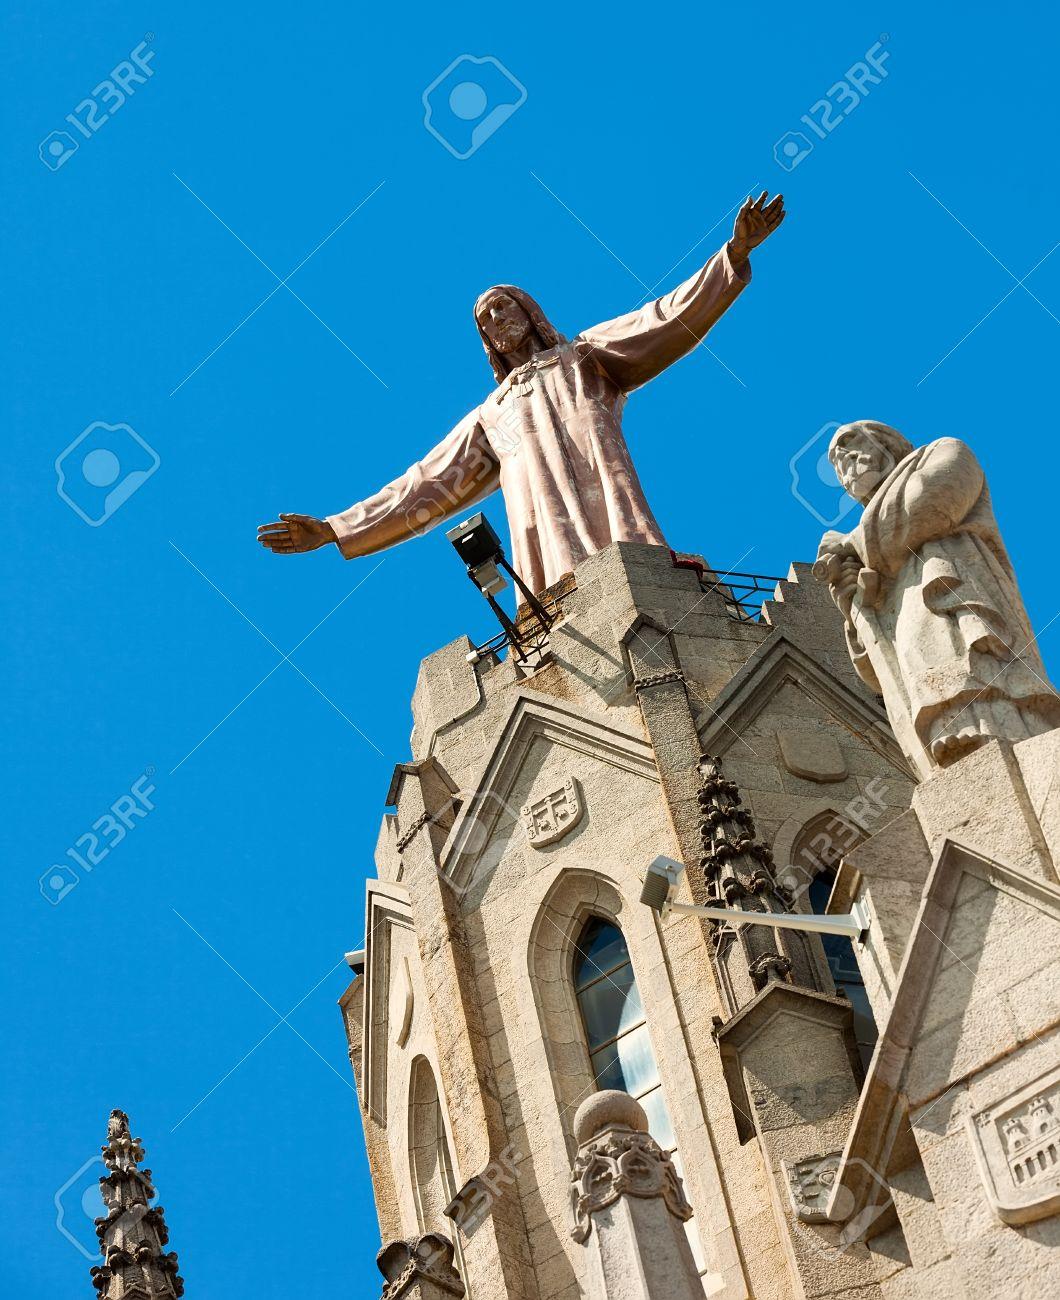 Sculpture of Jesus on top of Temple of Sagrat Cor at Tibidabo in  Barcelona, Spain Stock Photo - 23178109